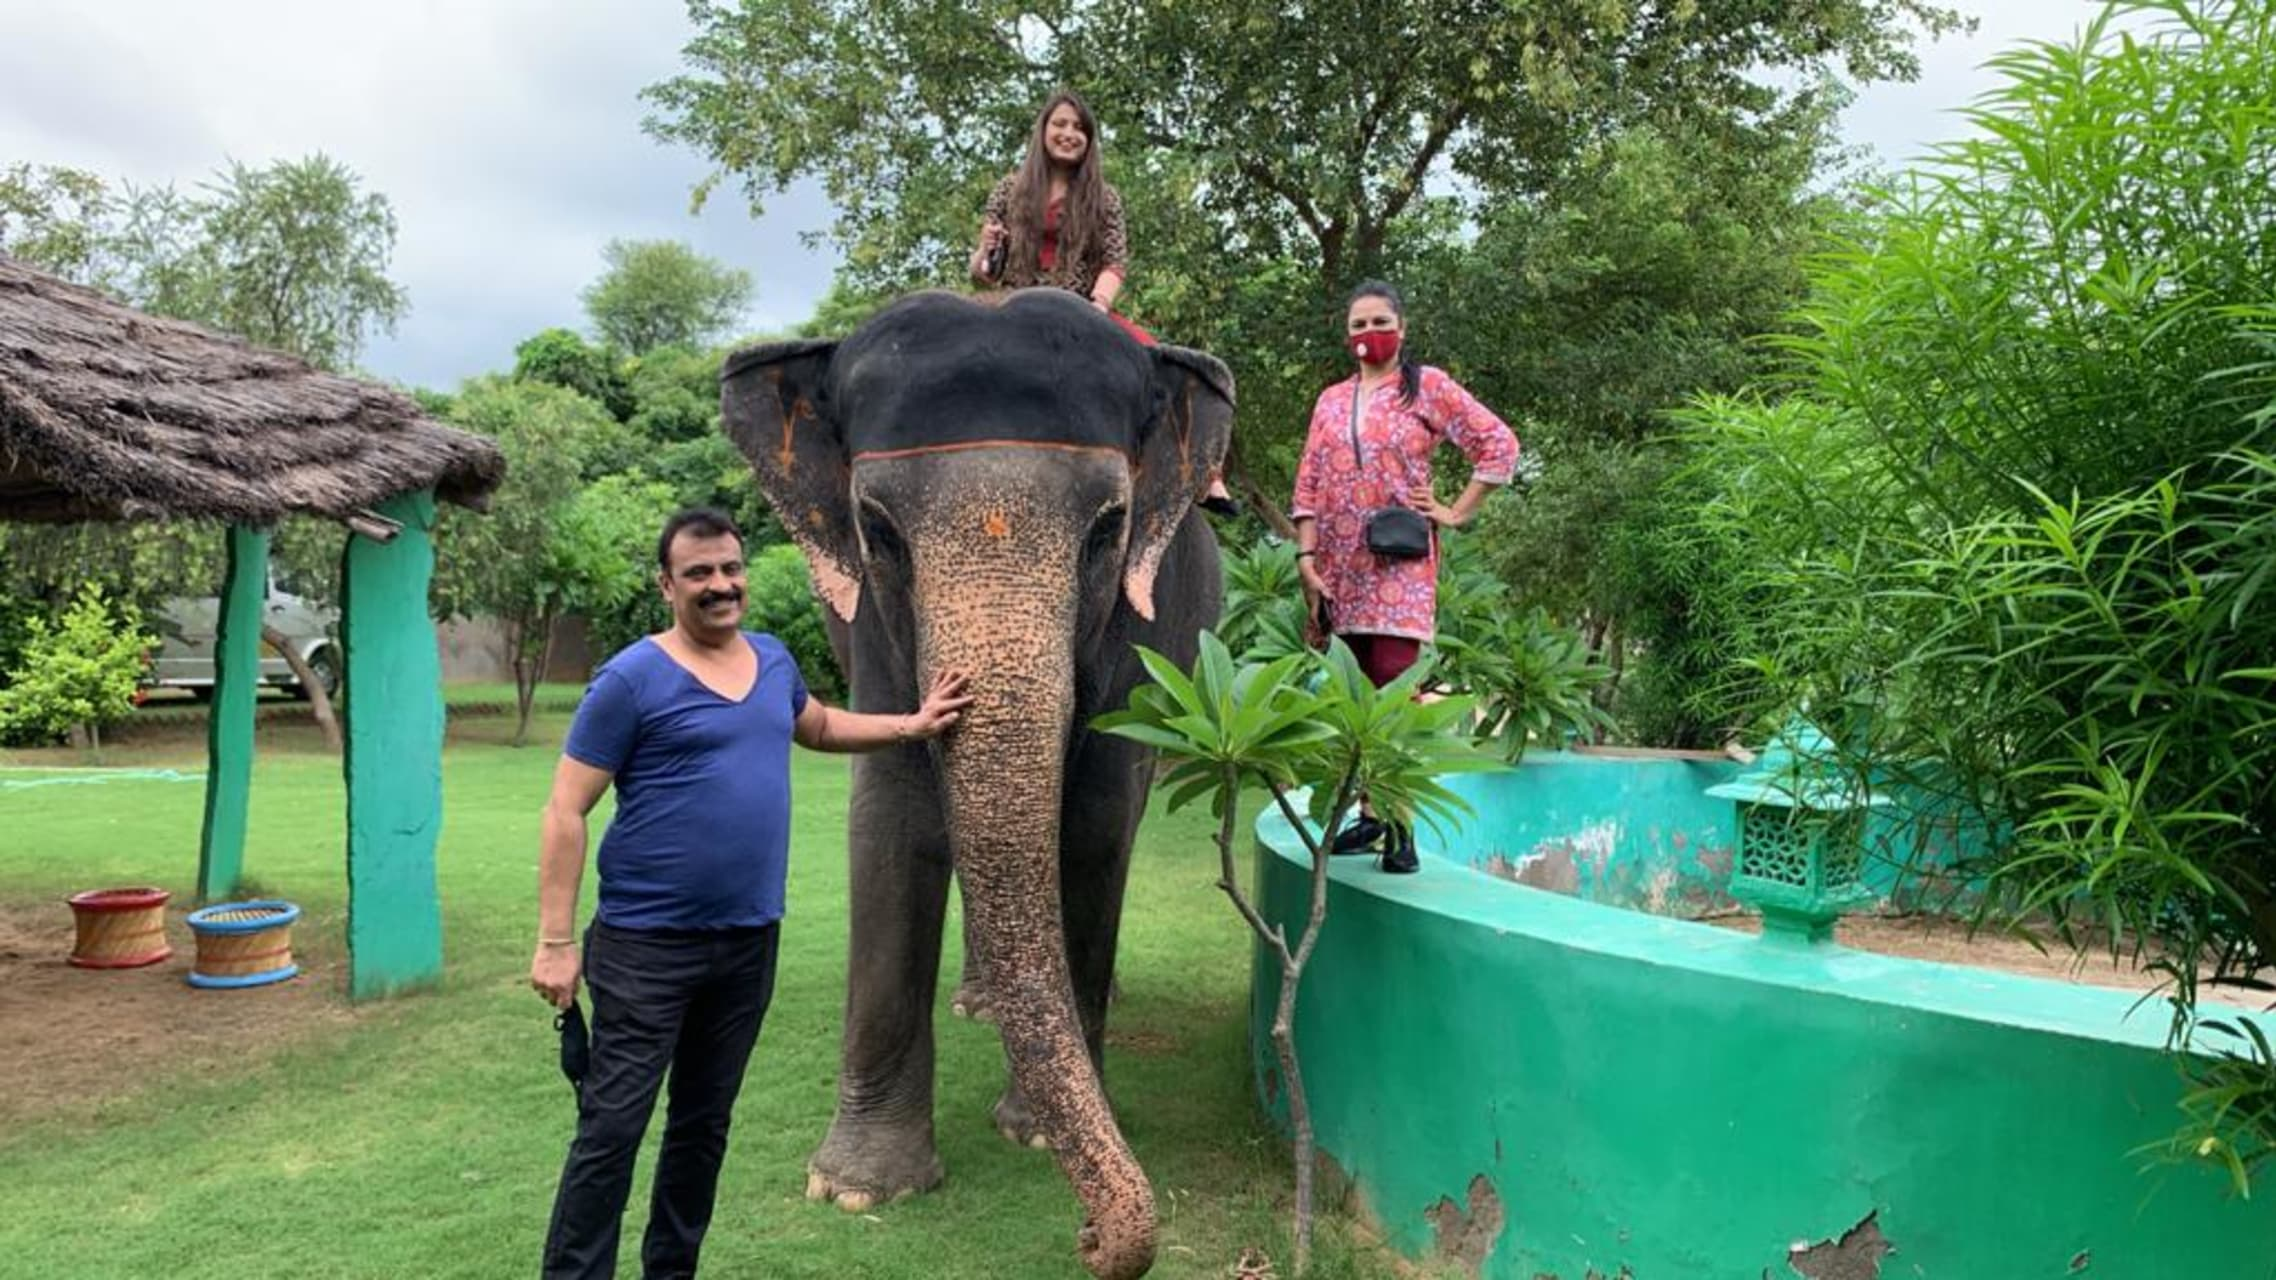 Jaipur - The Elephant Sanctuary